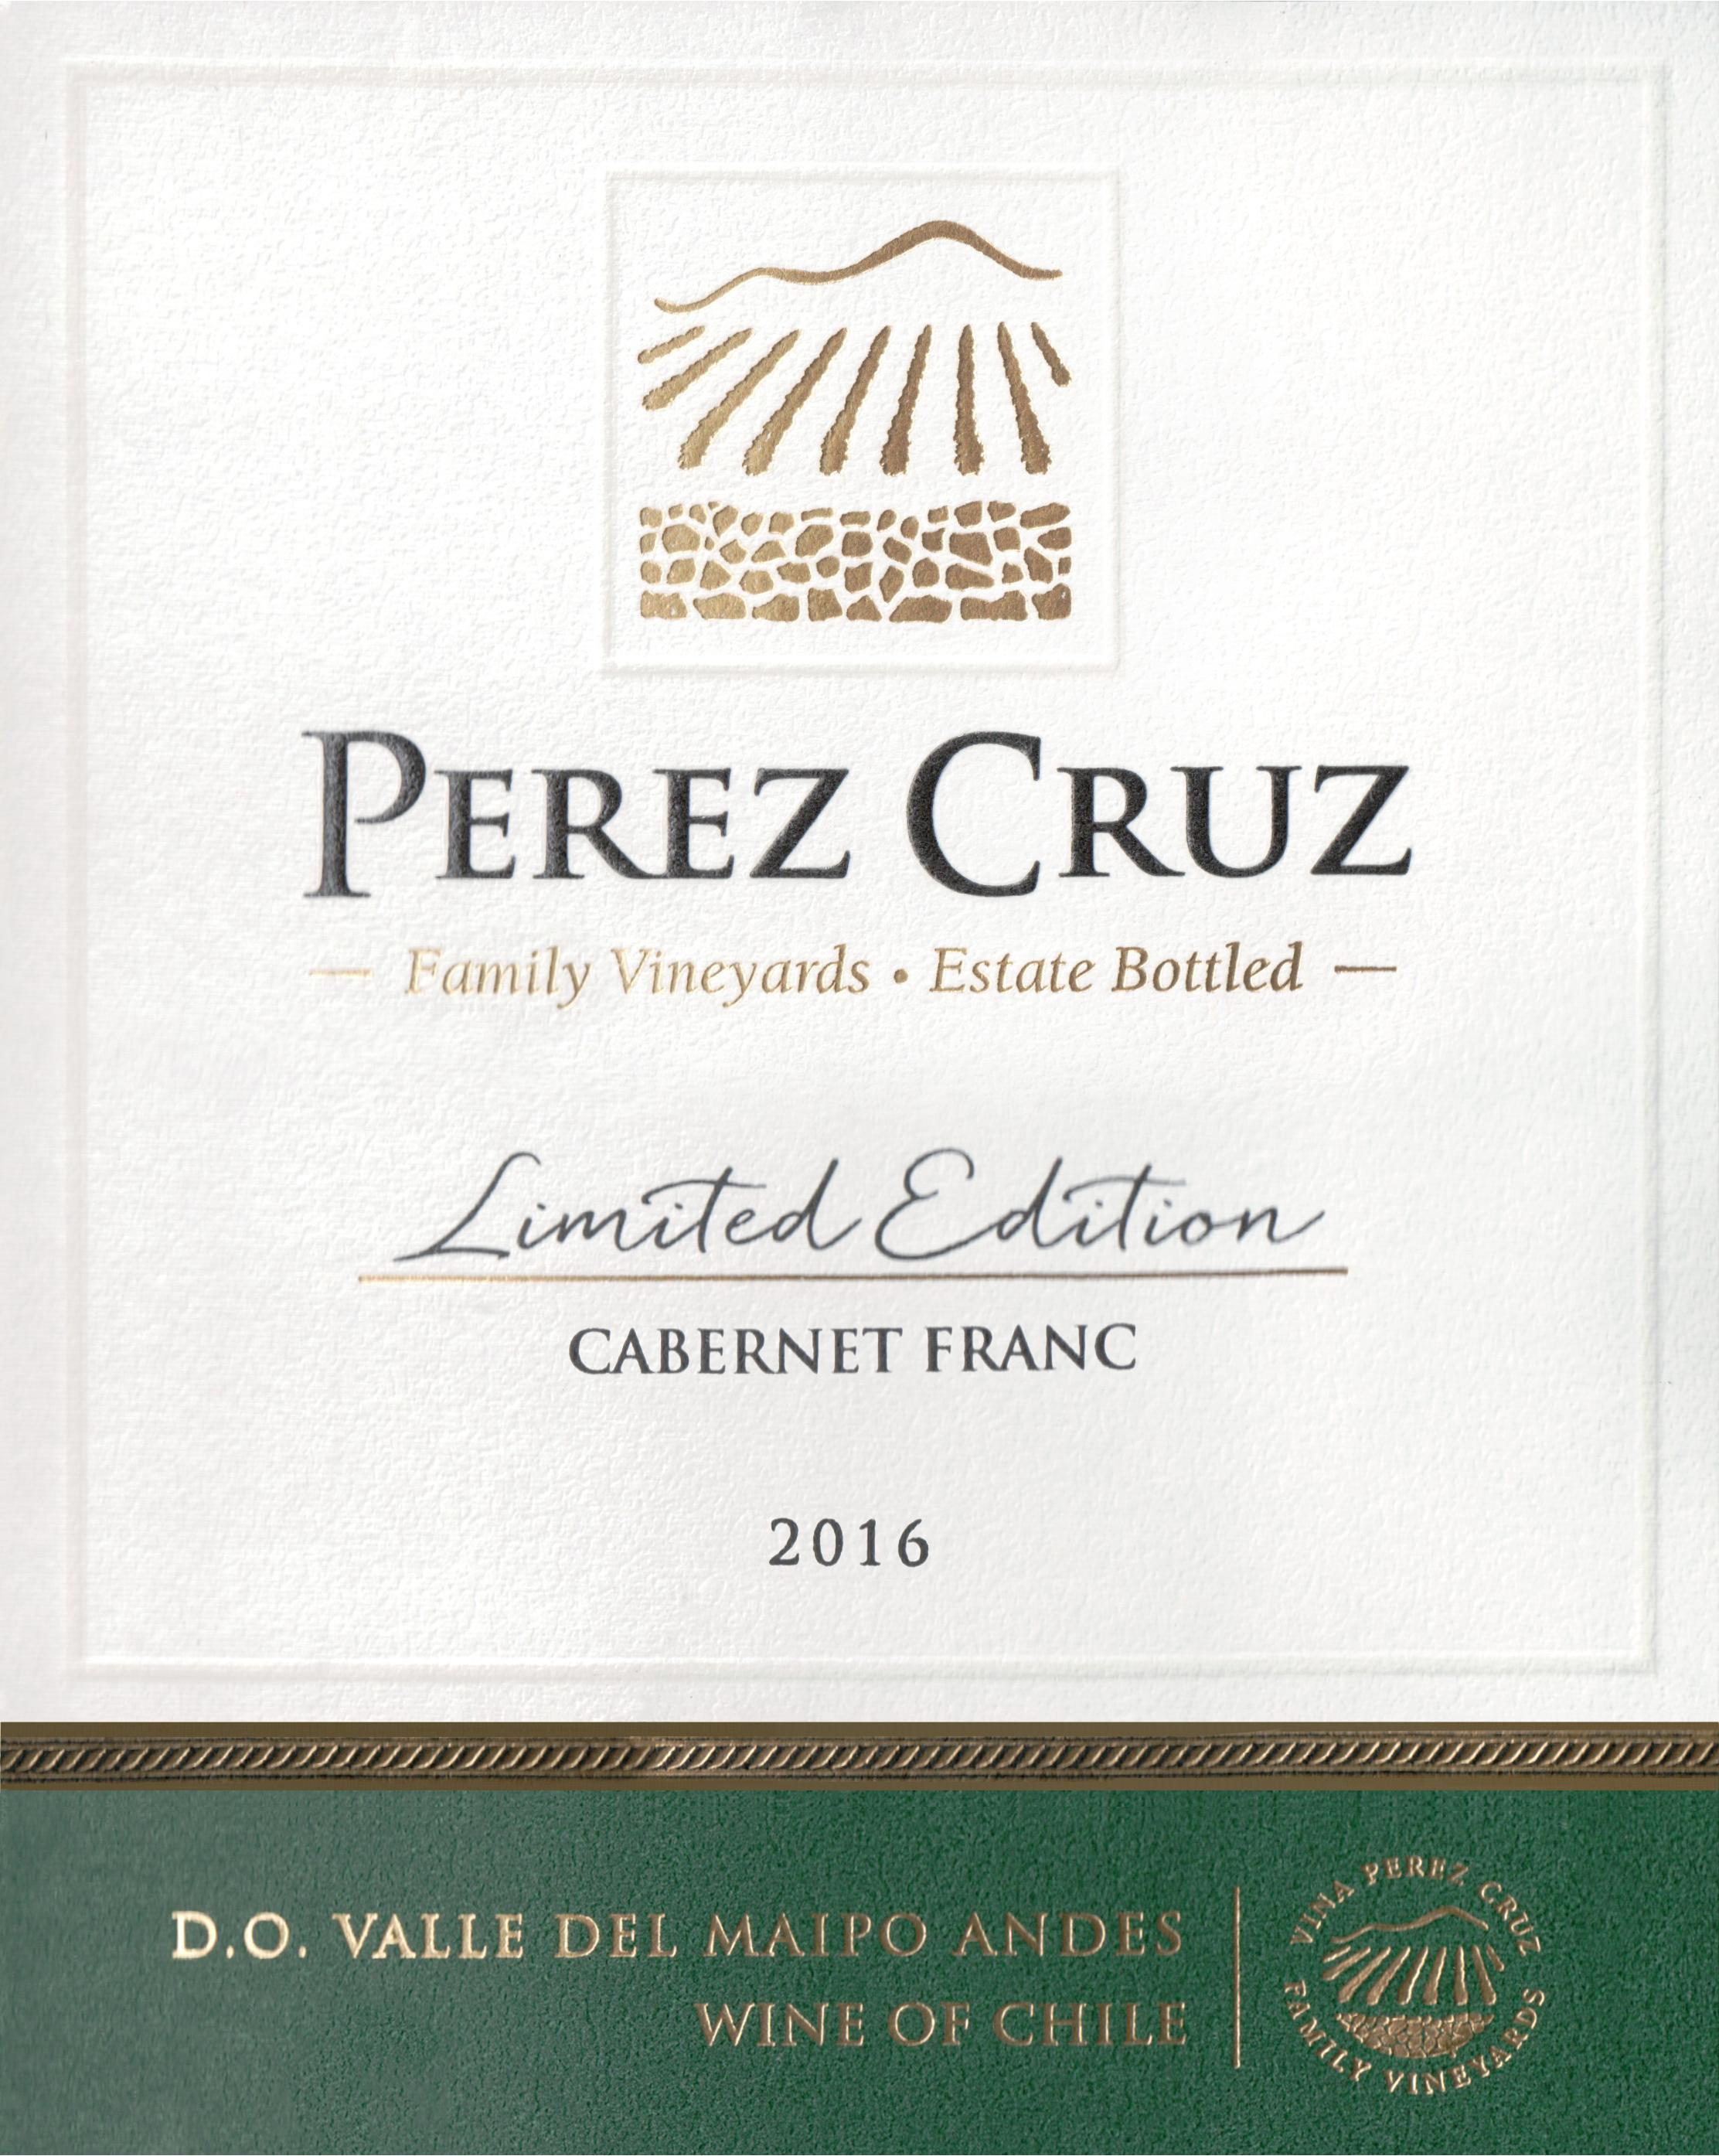 Vina Perez Cruz Limited Cabernet Franc 2016